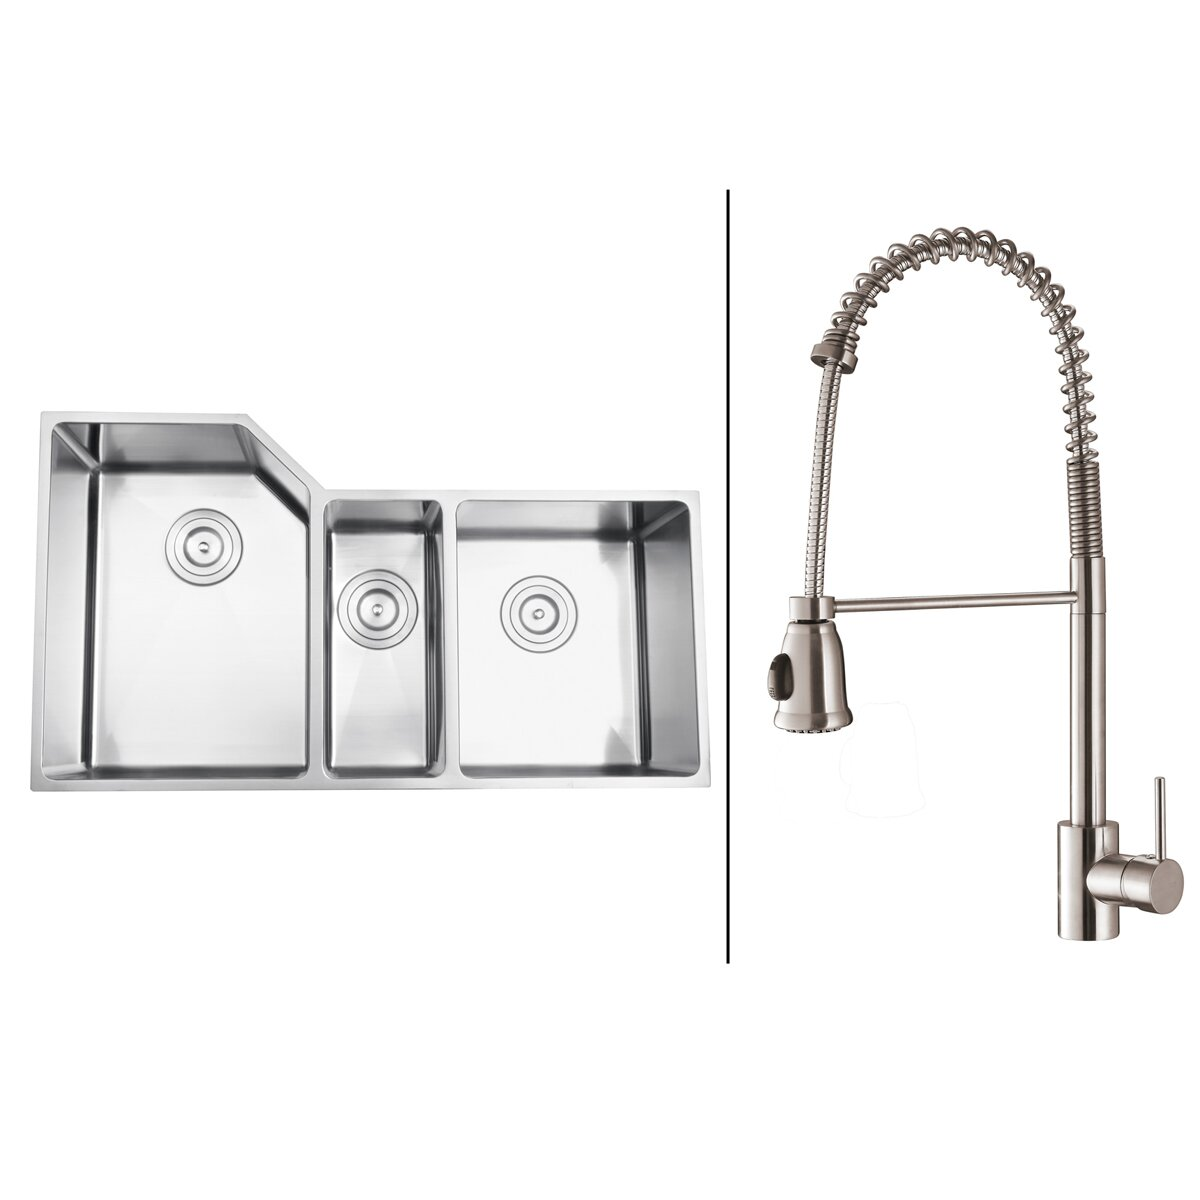 Ruvati X Kitchen Sink With Faucet Wayfair